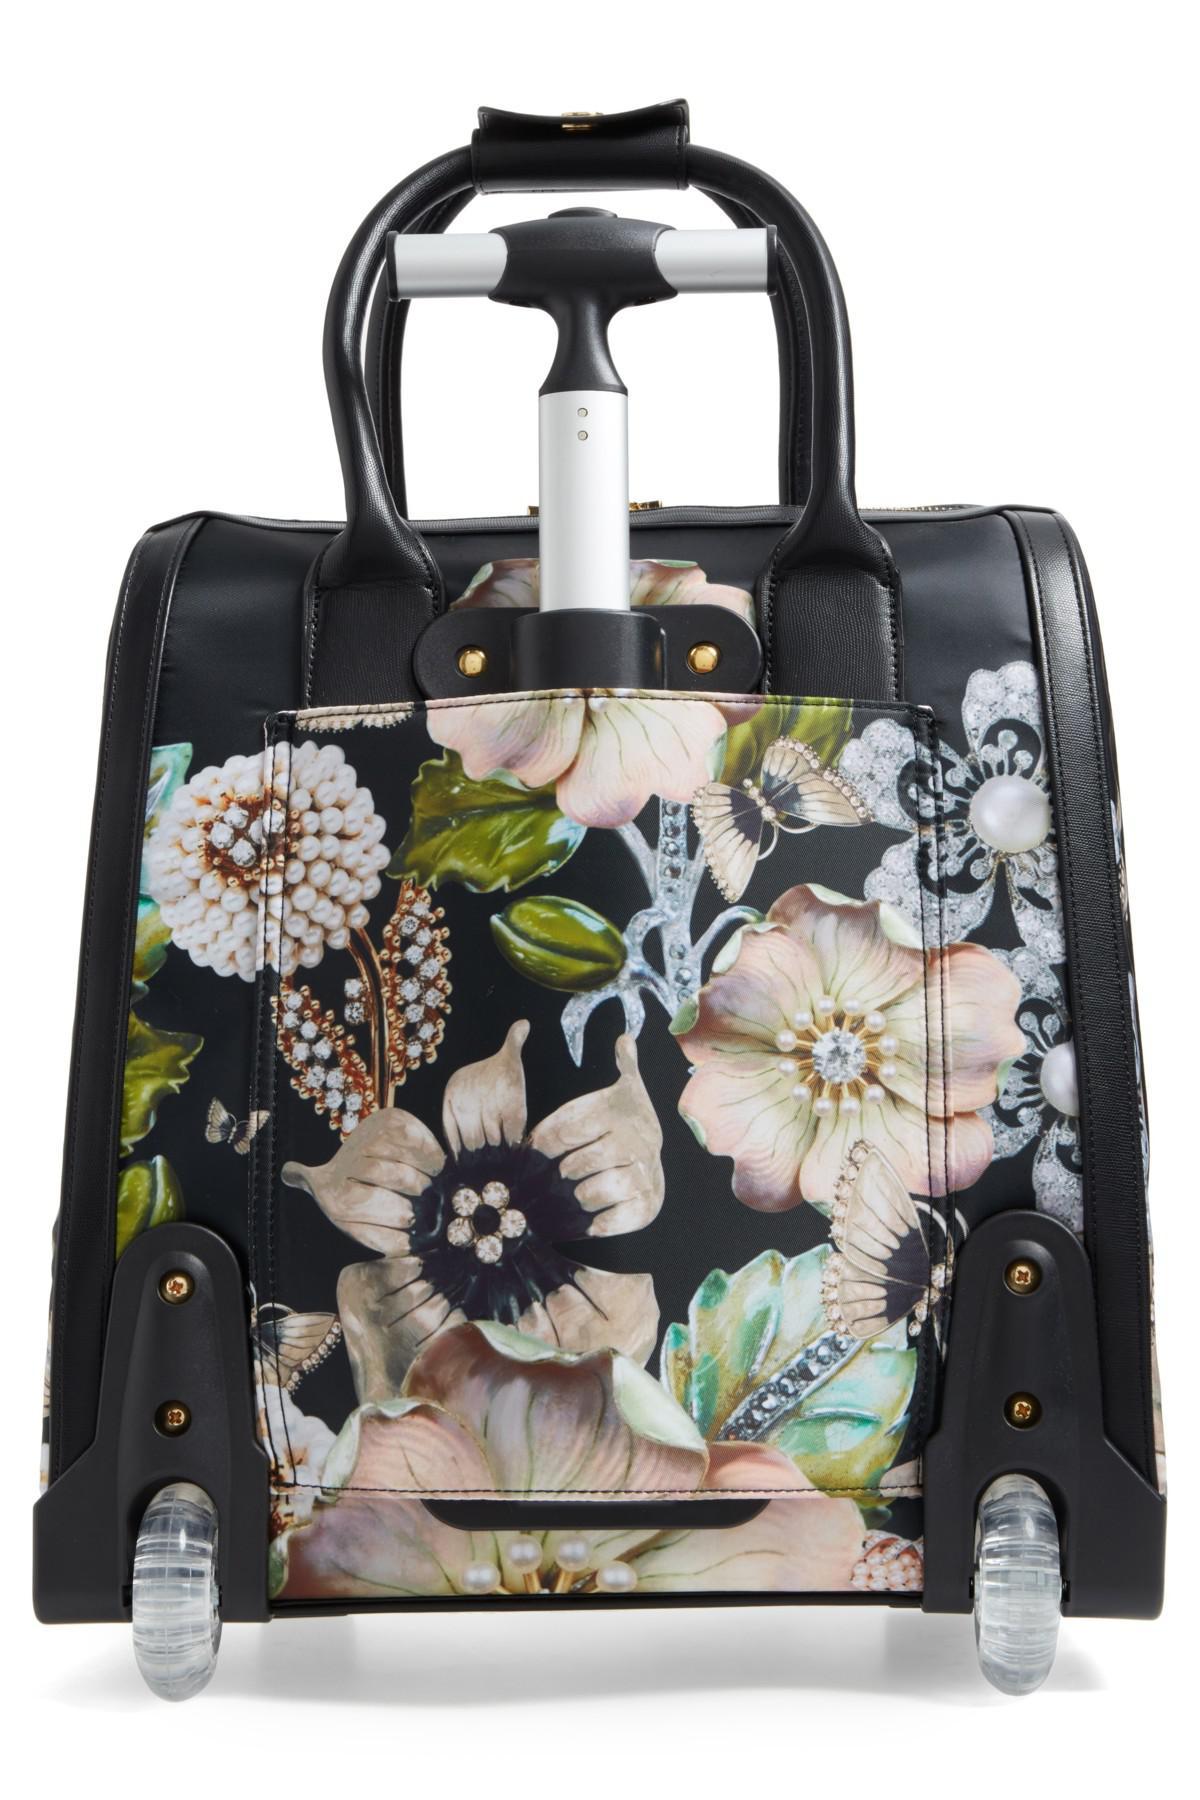 a96bfdf97 Ted Baker Inez Gem Gardens Two-wheel Travel Bag in Black - Lyst